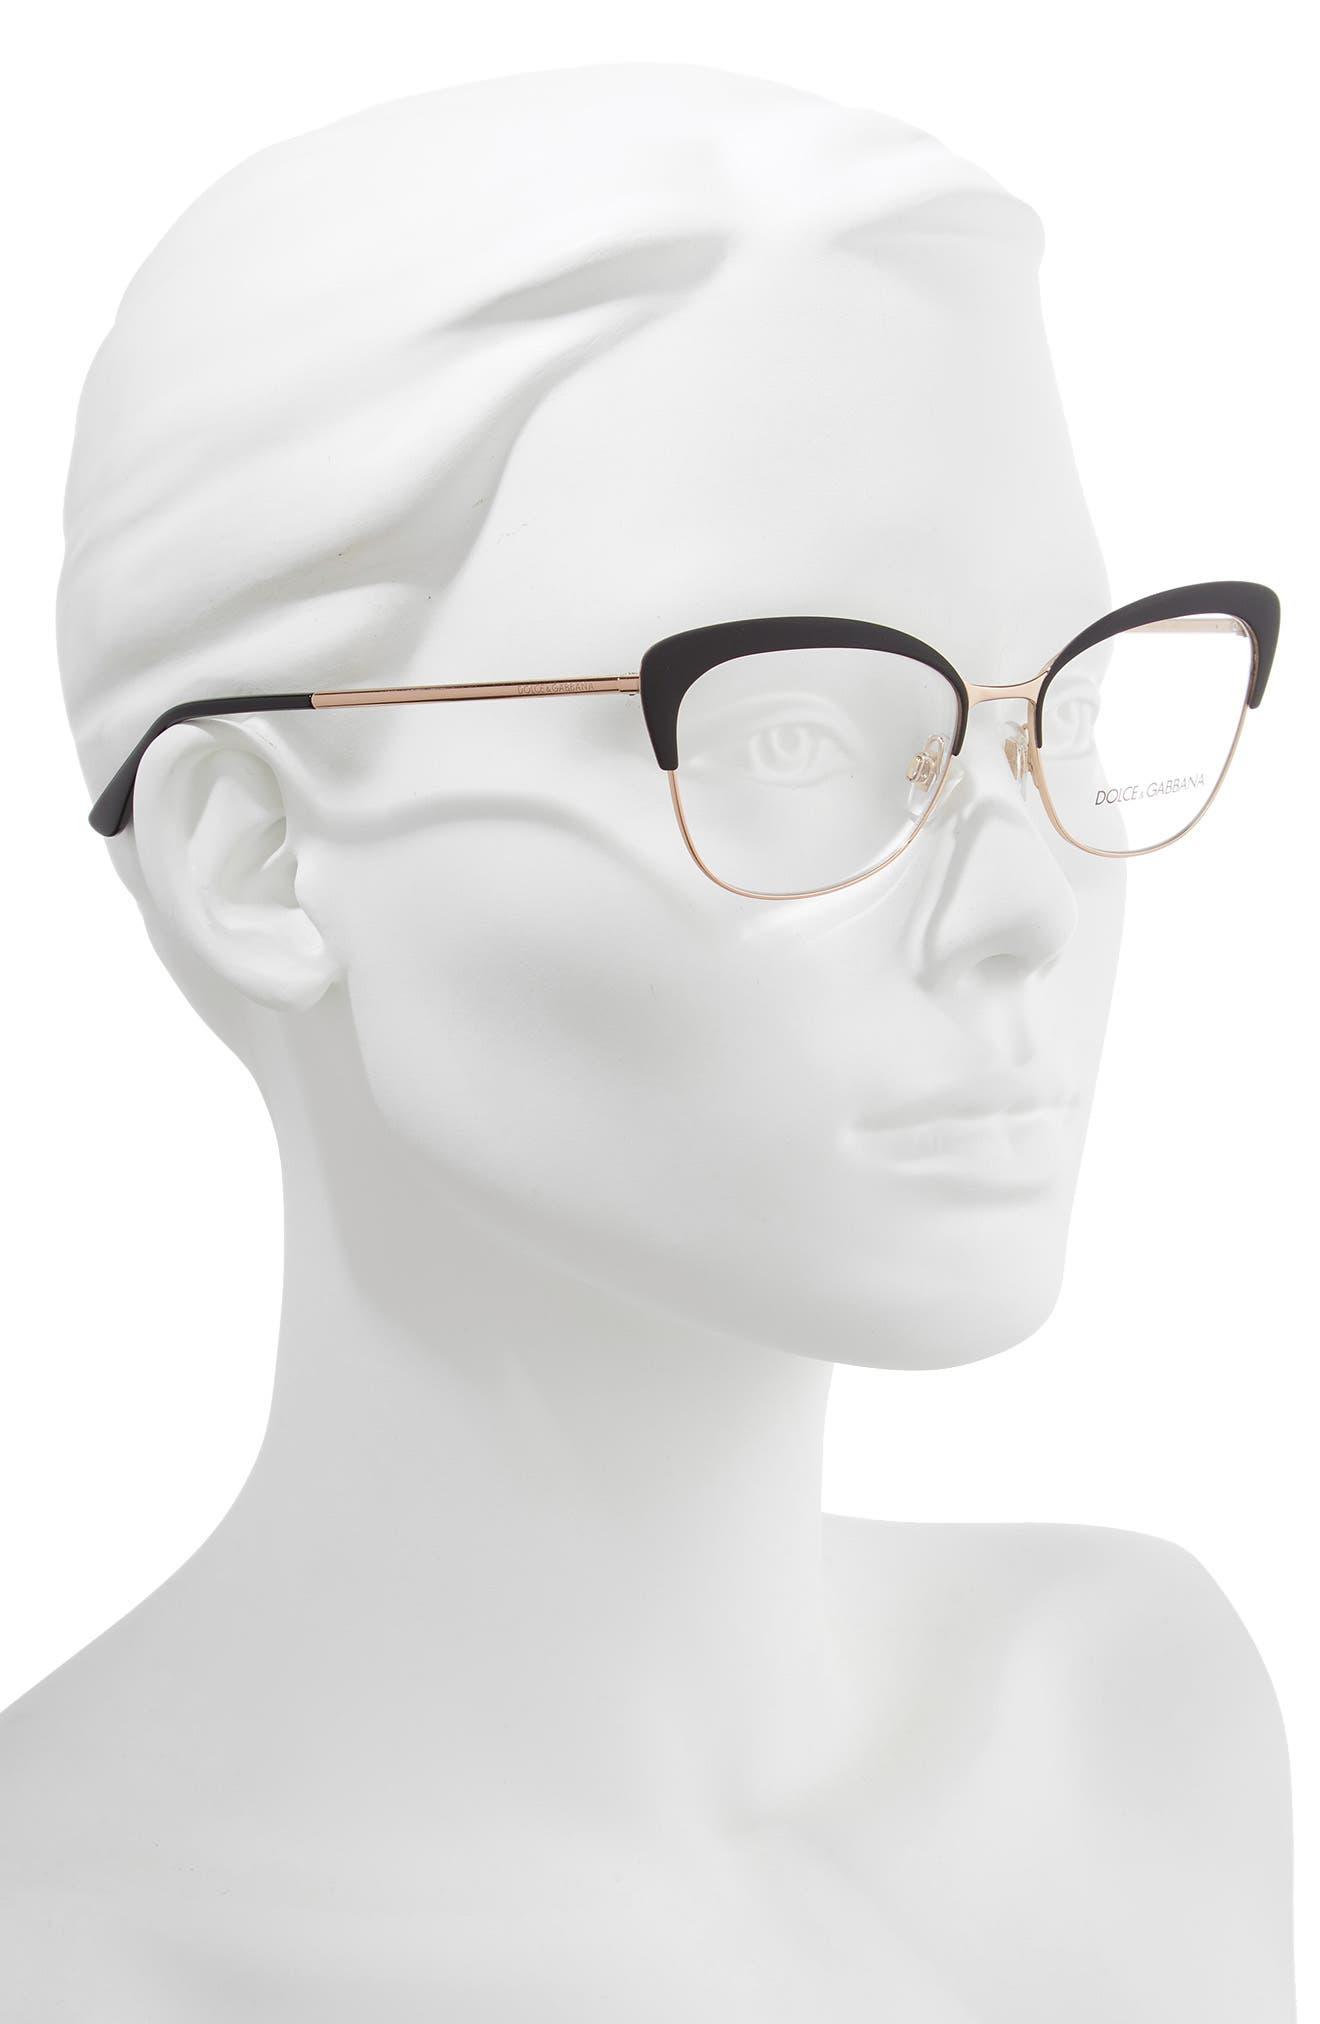 54mm Optical Glasses,                             Alternate thumbnail 2, color,                             BLACK/ PINK